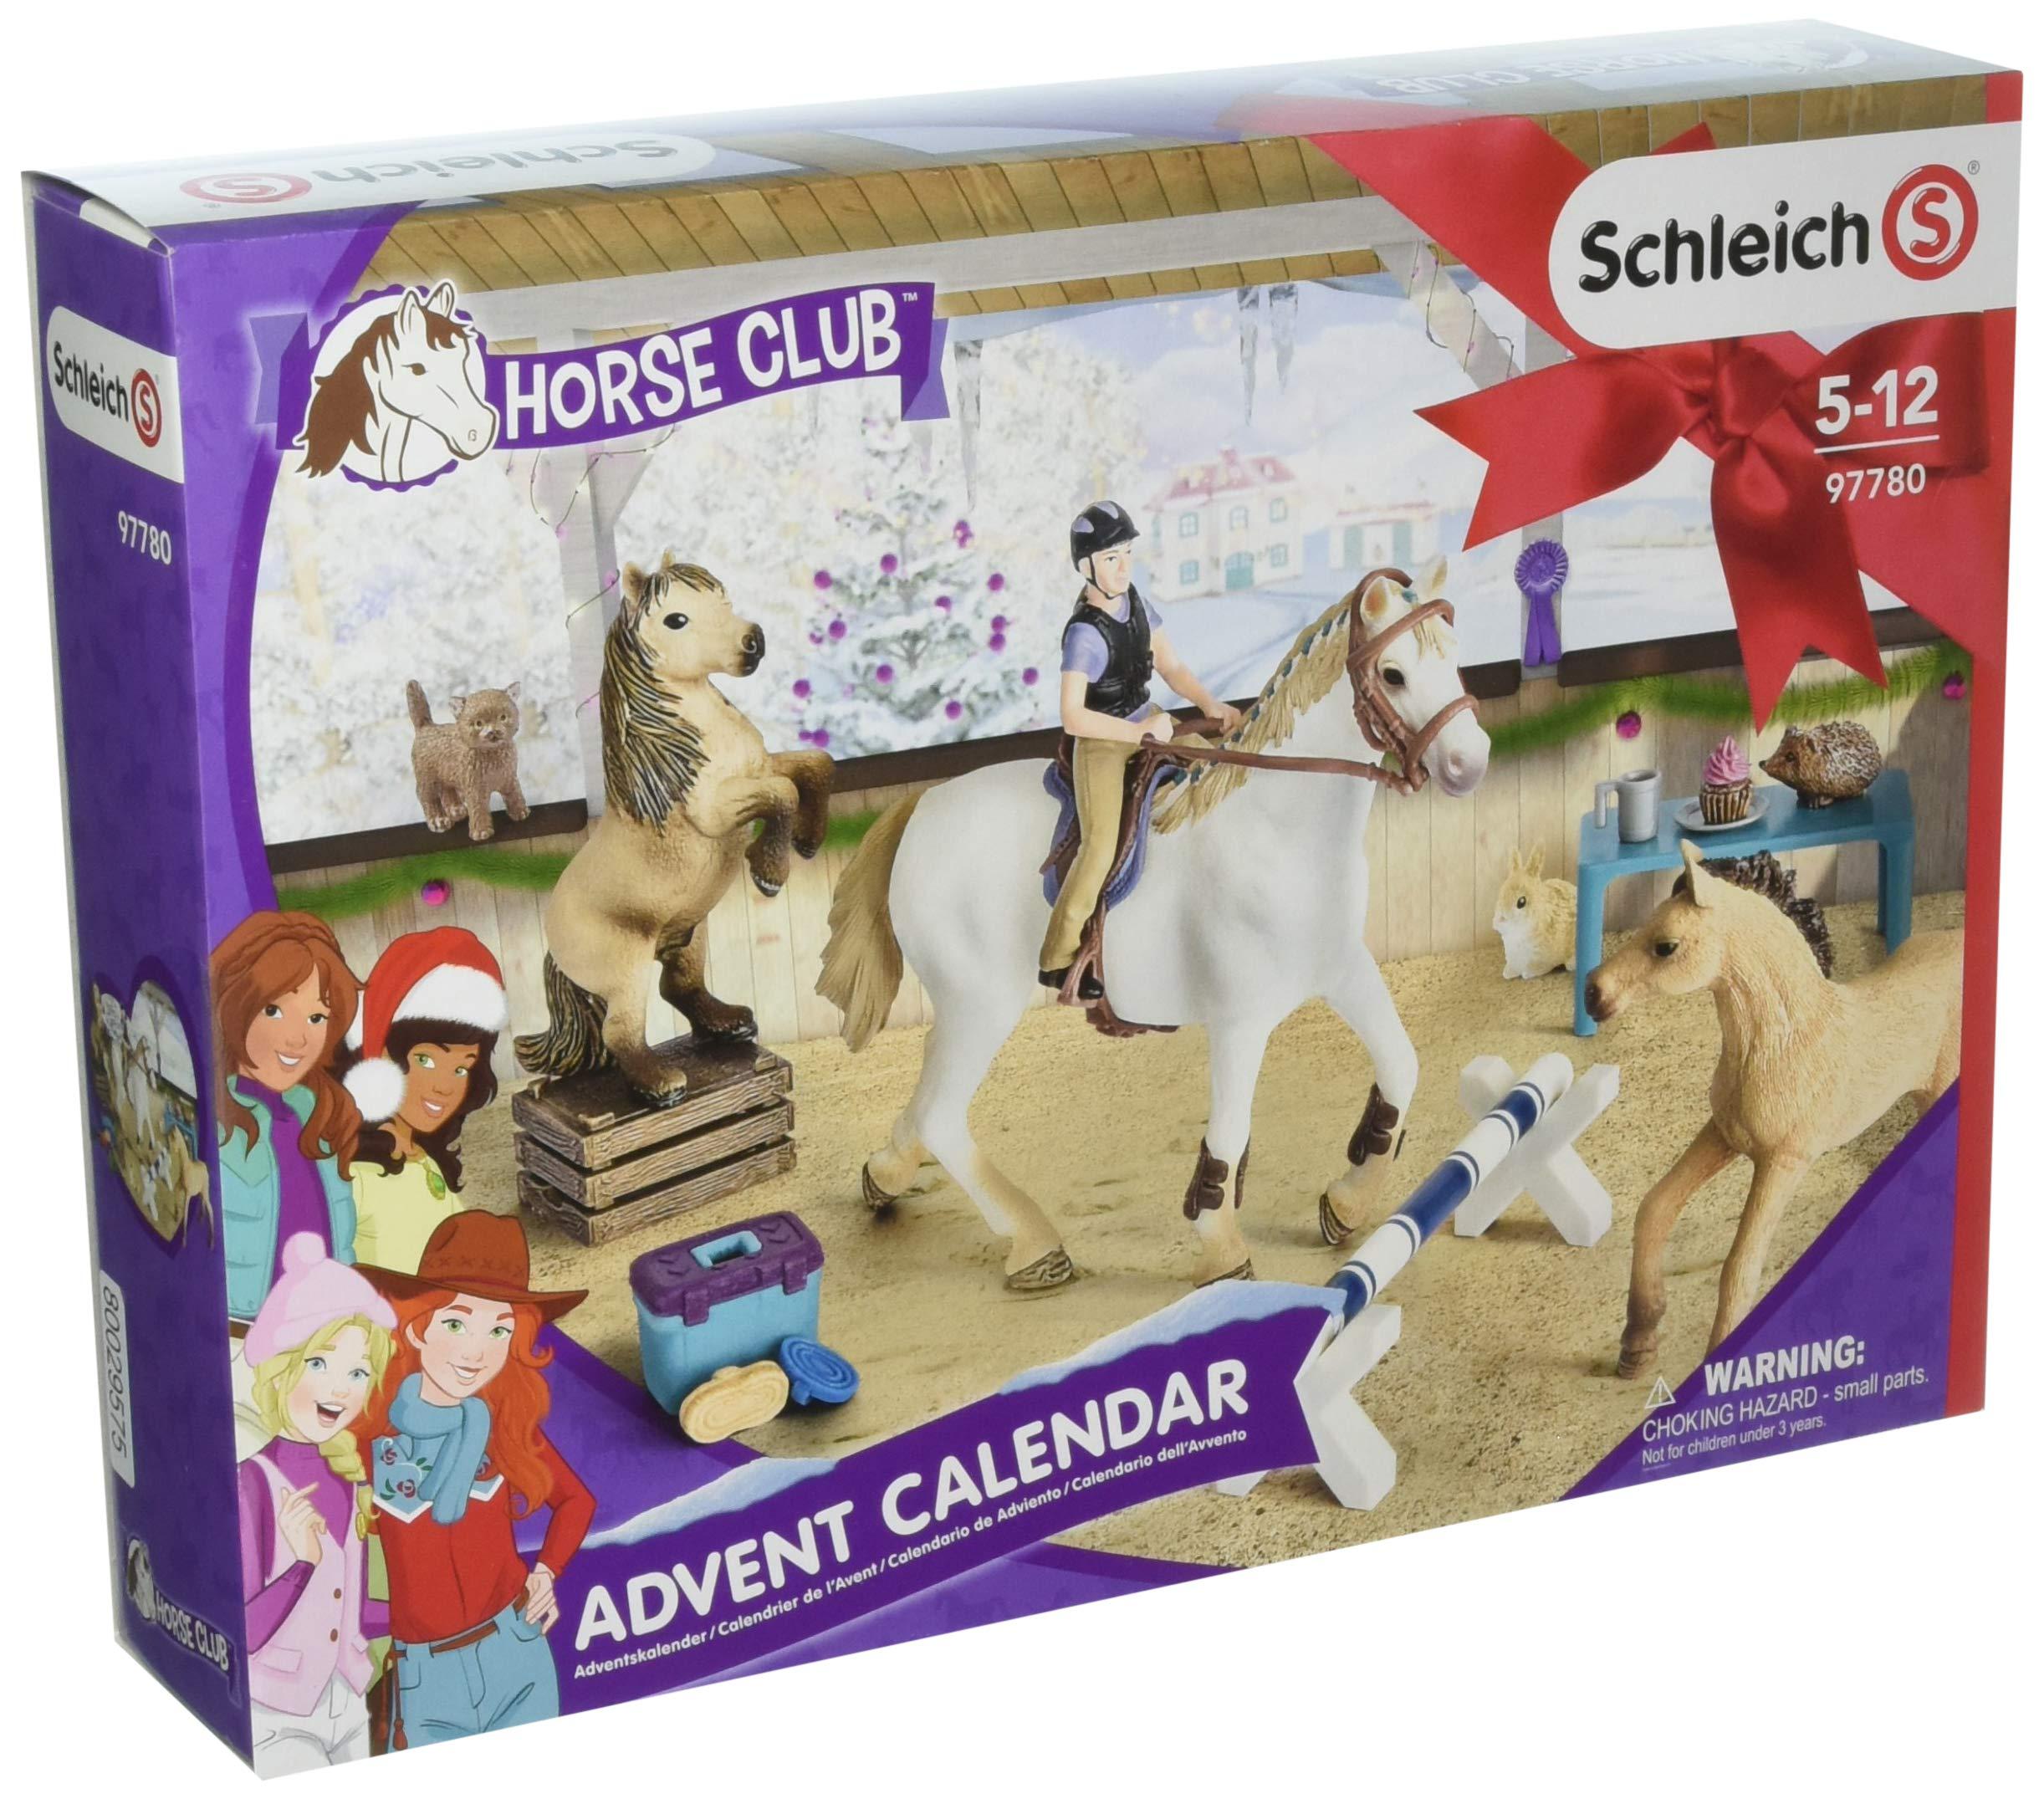 Schleich Horse Club Advent Calendar 2018